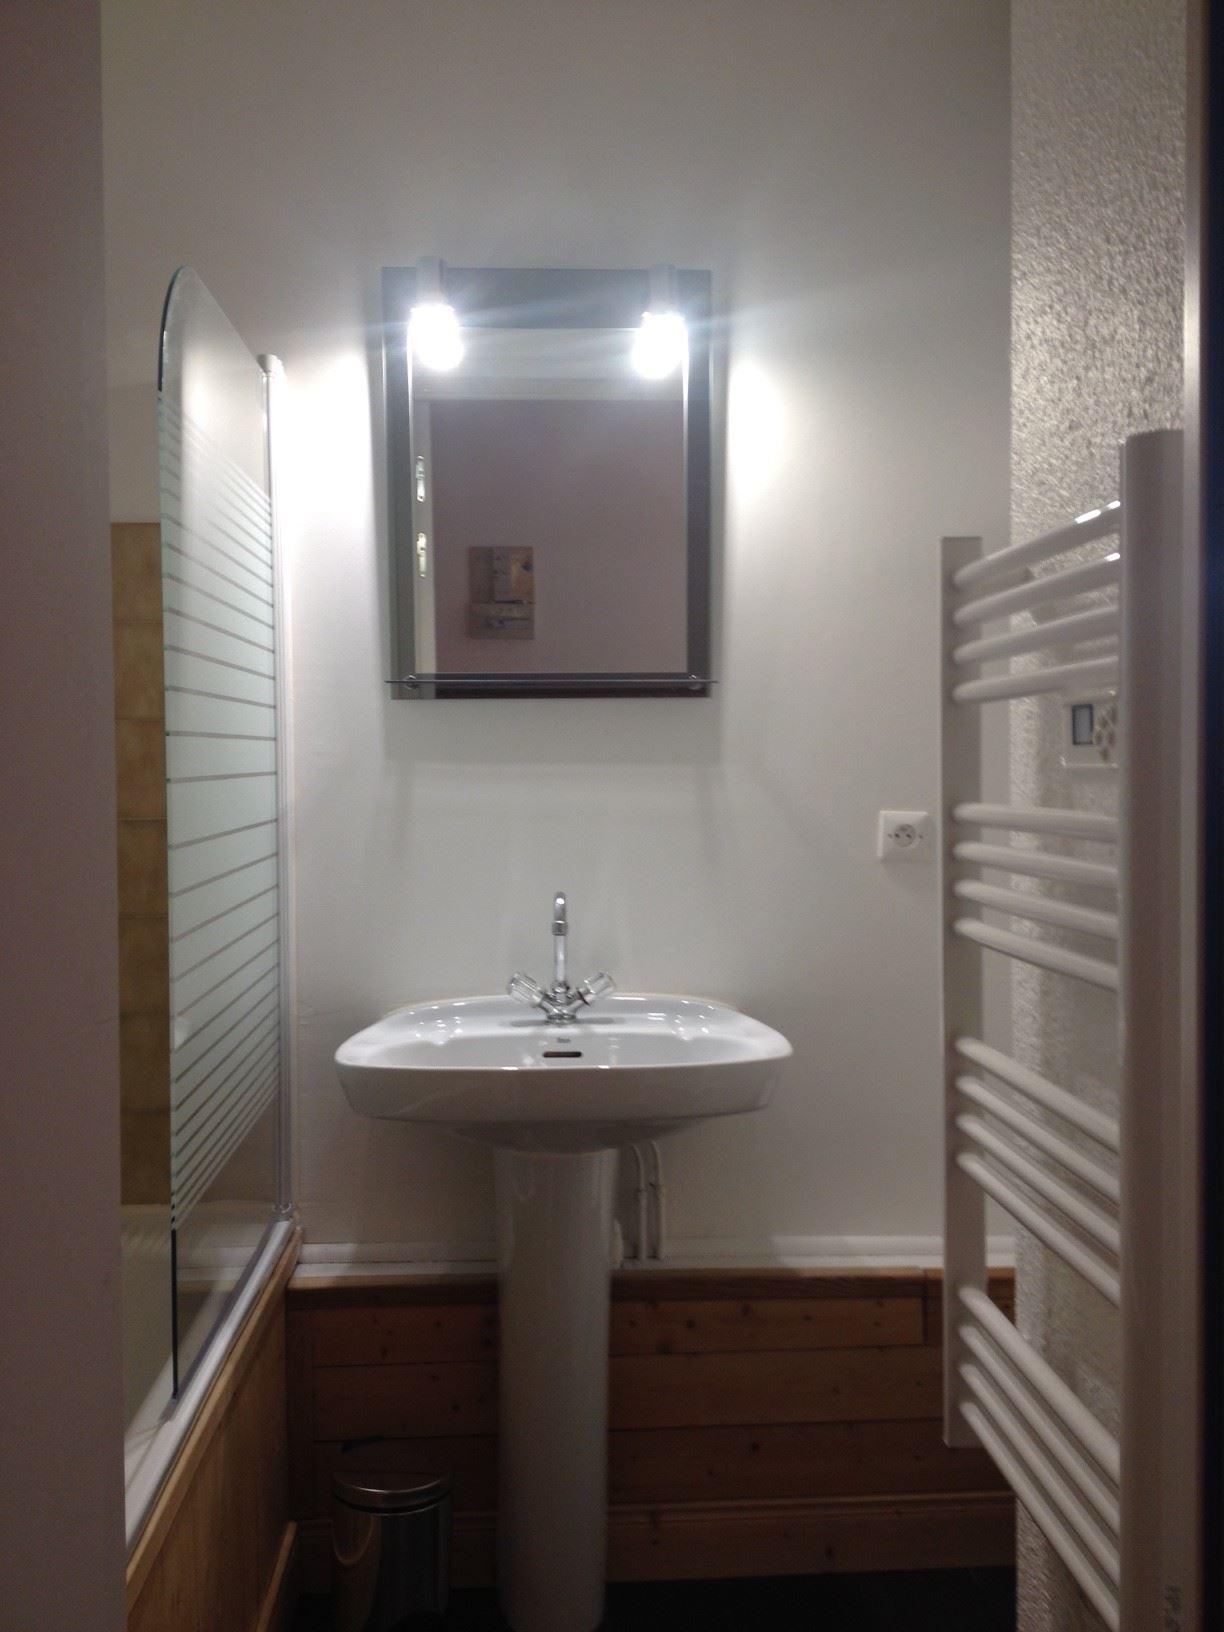 Cimes de Caron 2706 > 2 Rooms - 3 Persons - 3 Silver Snowflakes (Ma Clé IMMO)